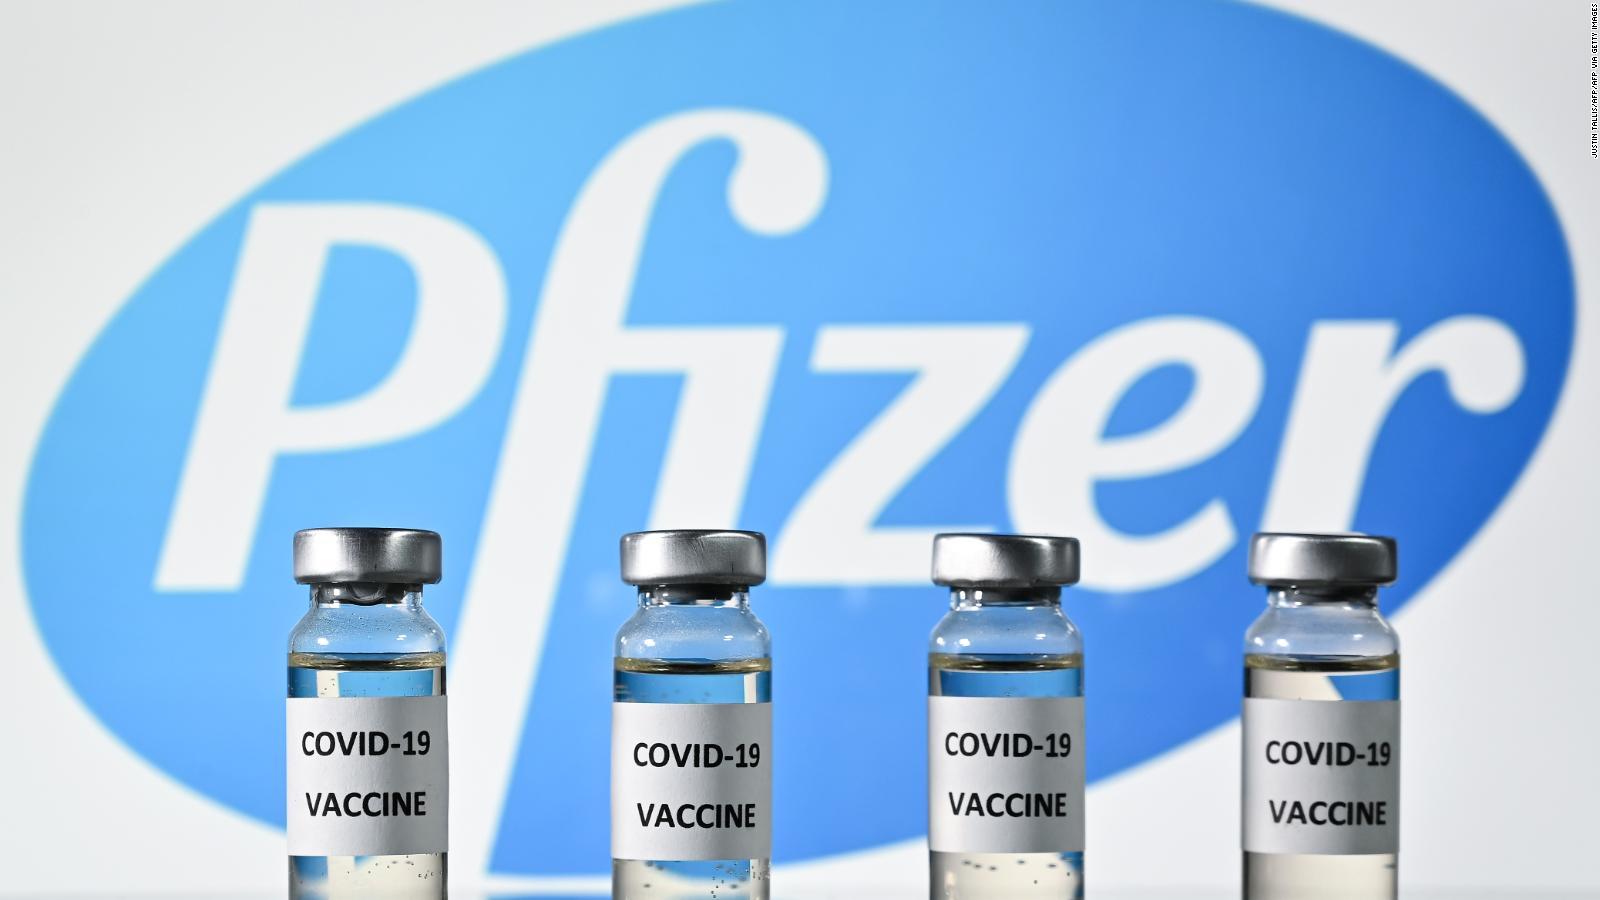 Vacuna coronavirus Pfizer-BioNtech: Piden autorización de emergencia